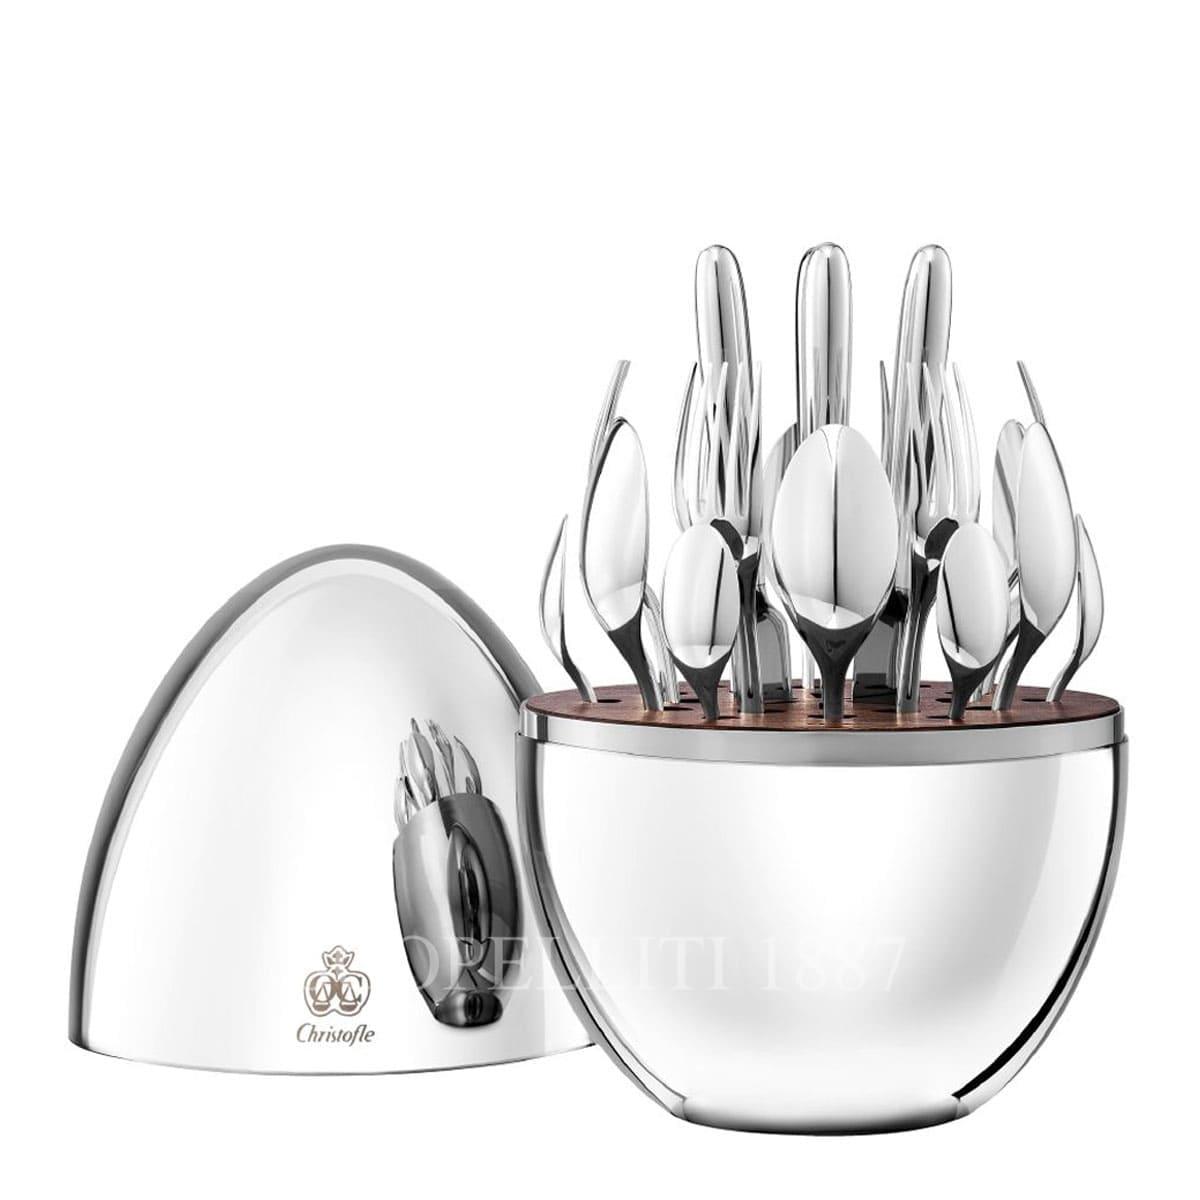 mood christofle silver plated flatware